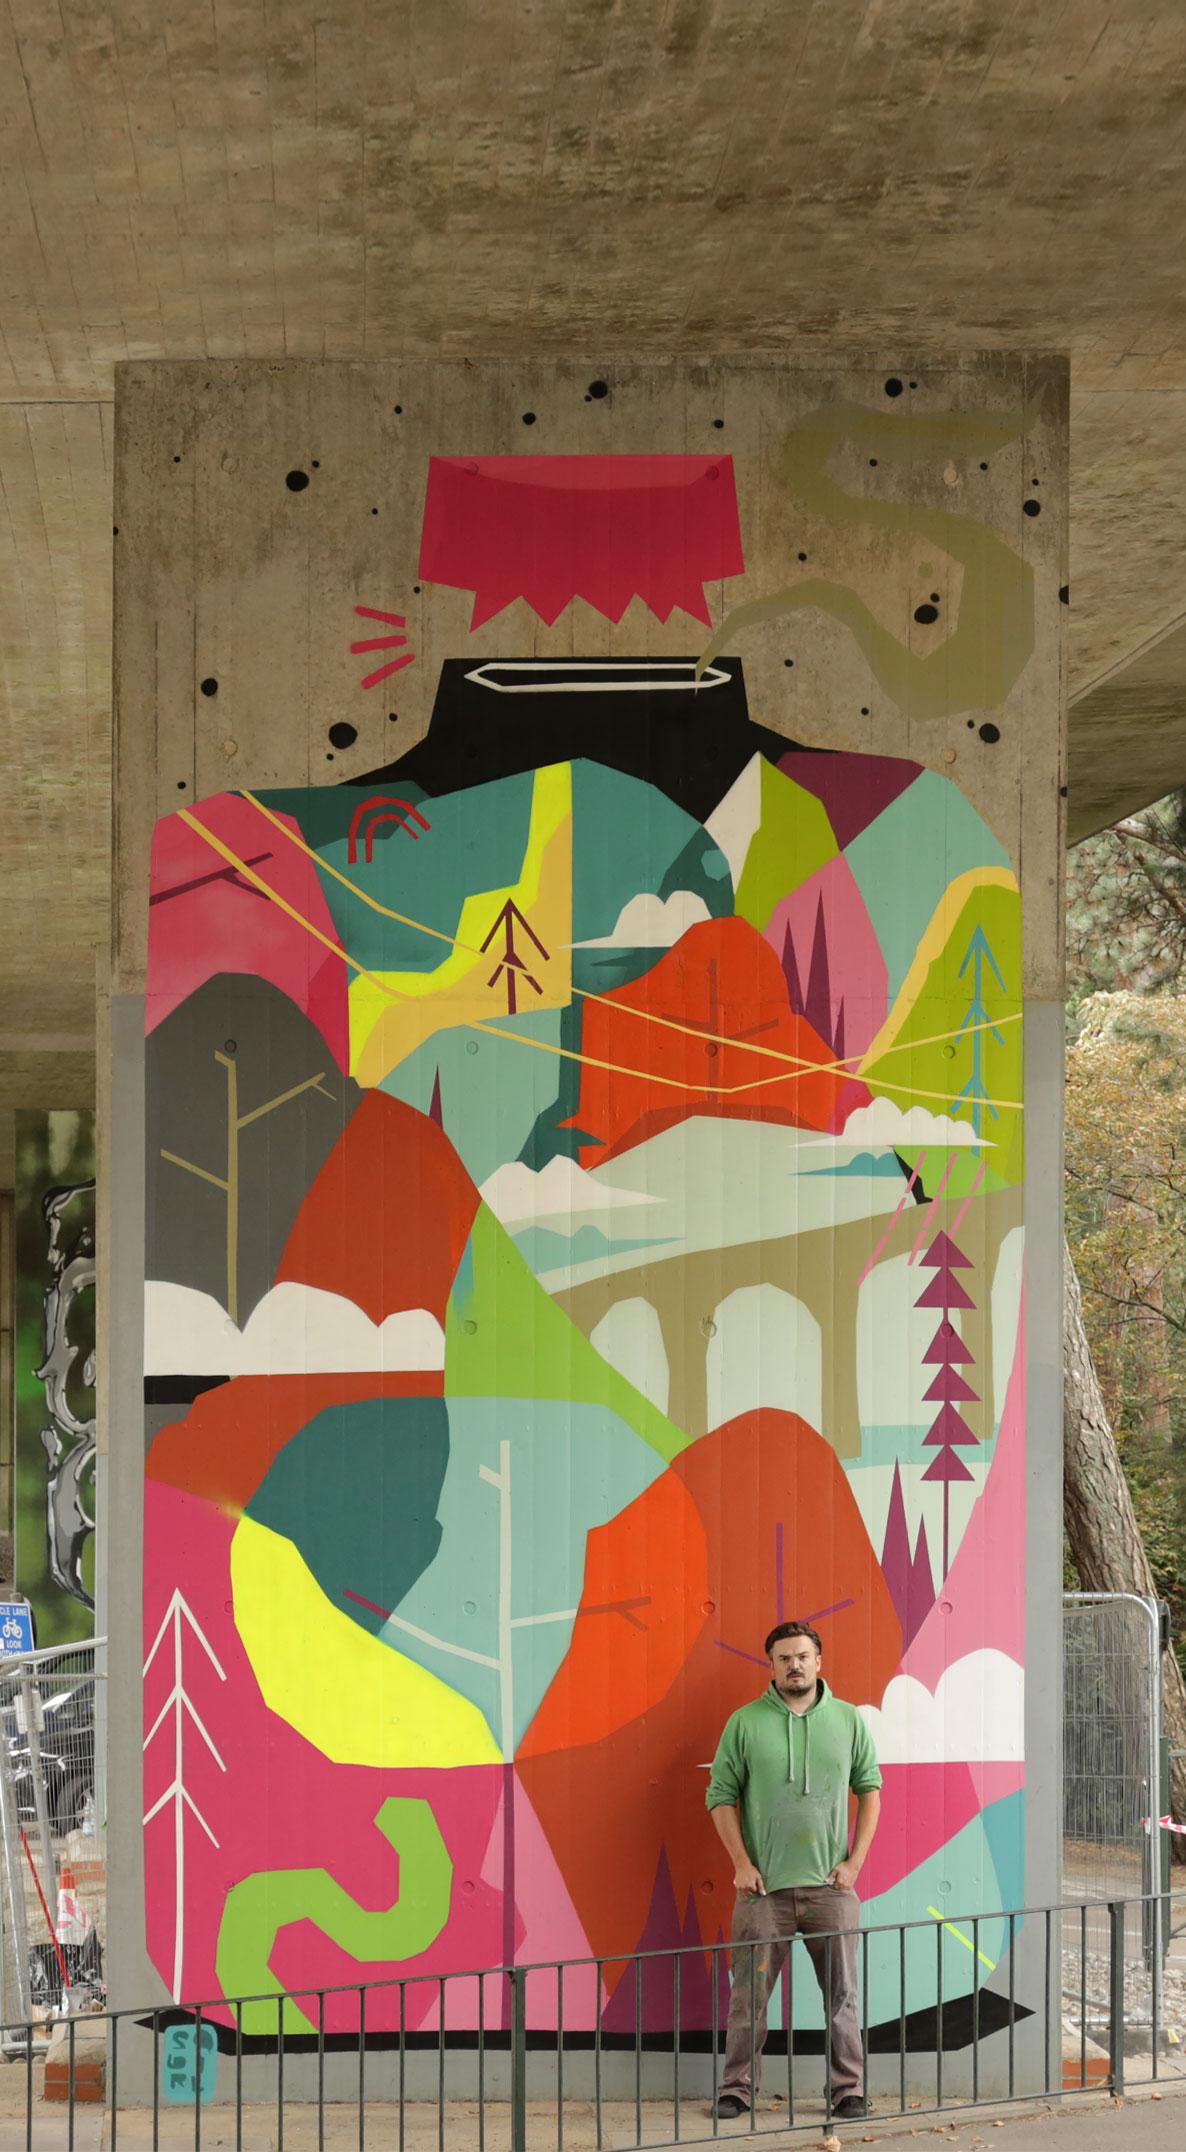 Graffiti artist Squirl mural at Upside Gallery